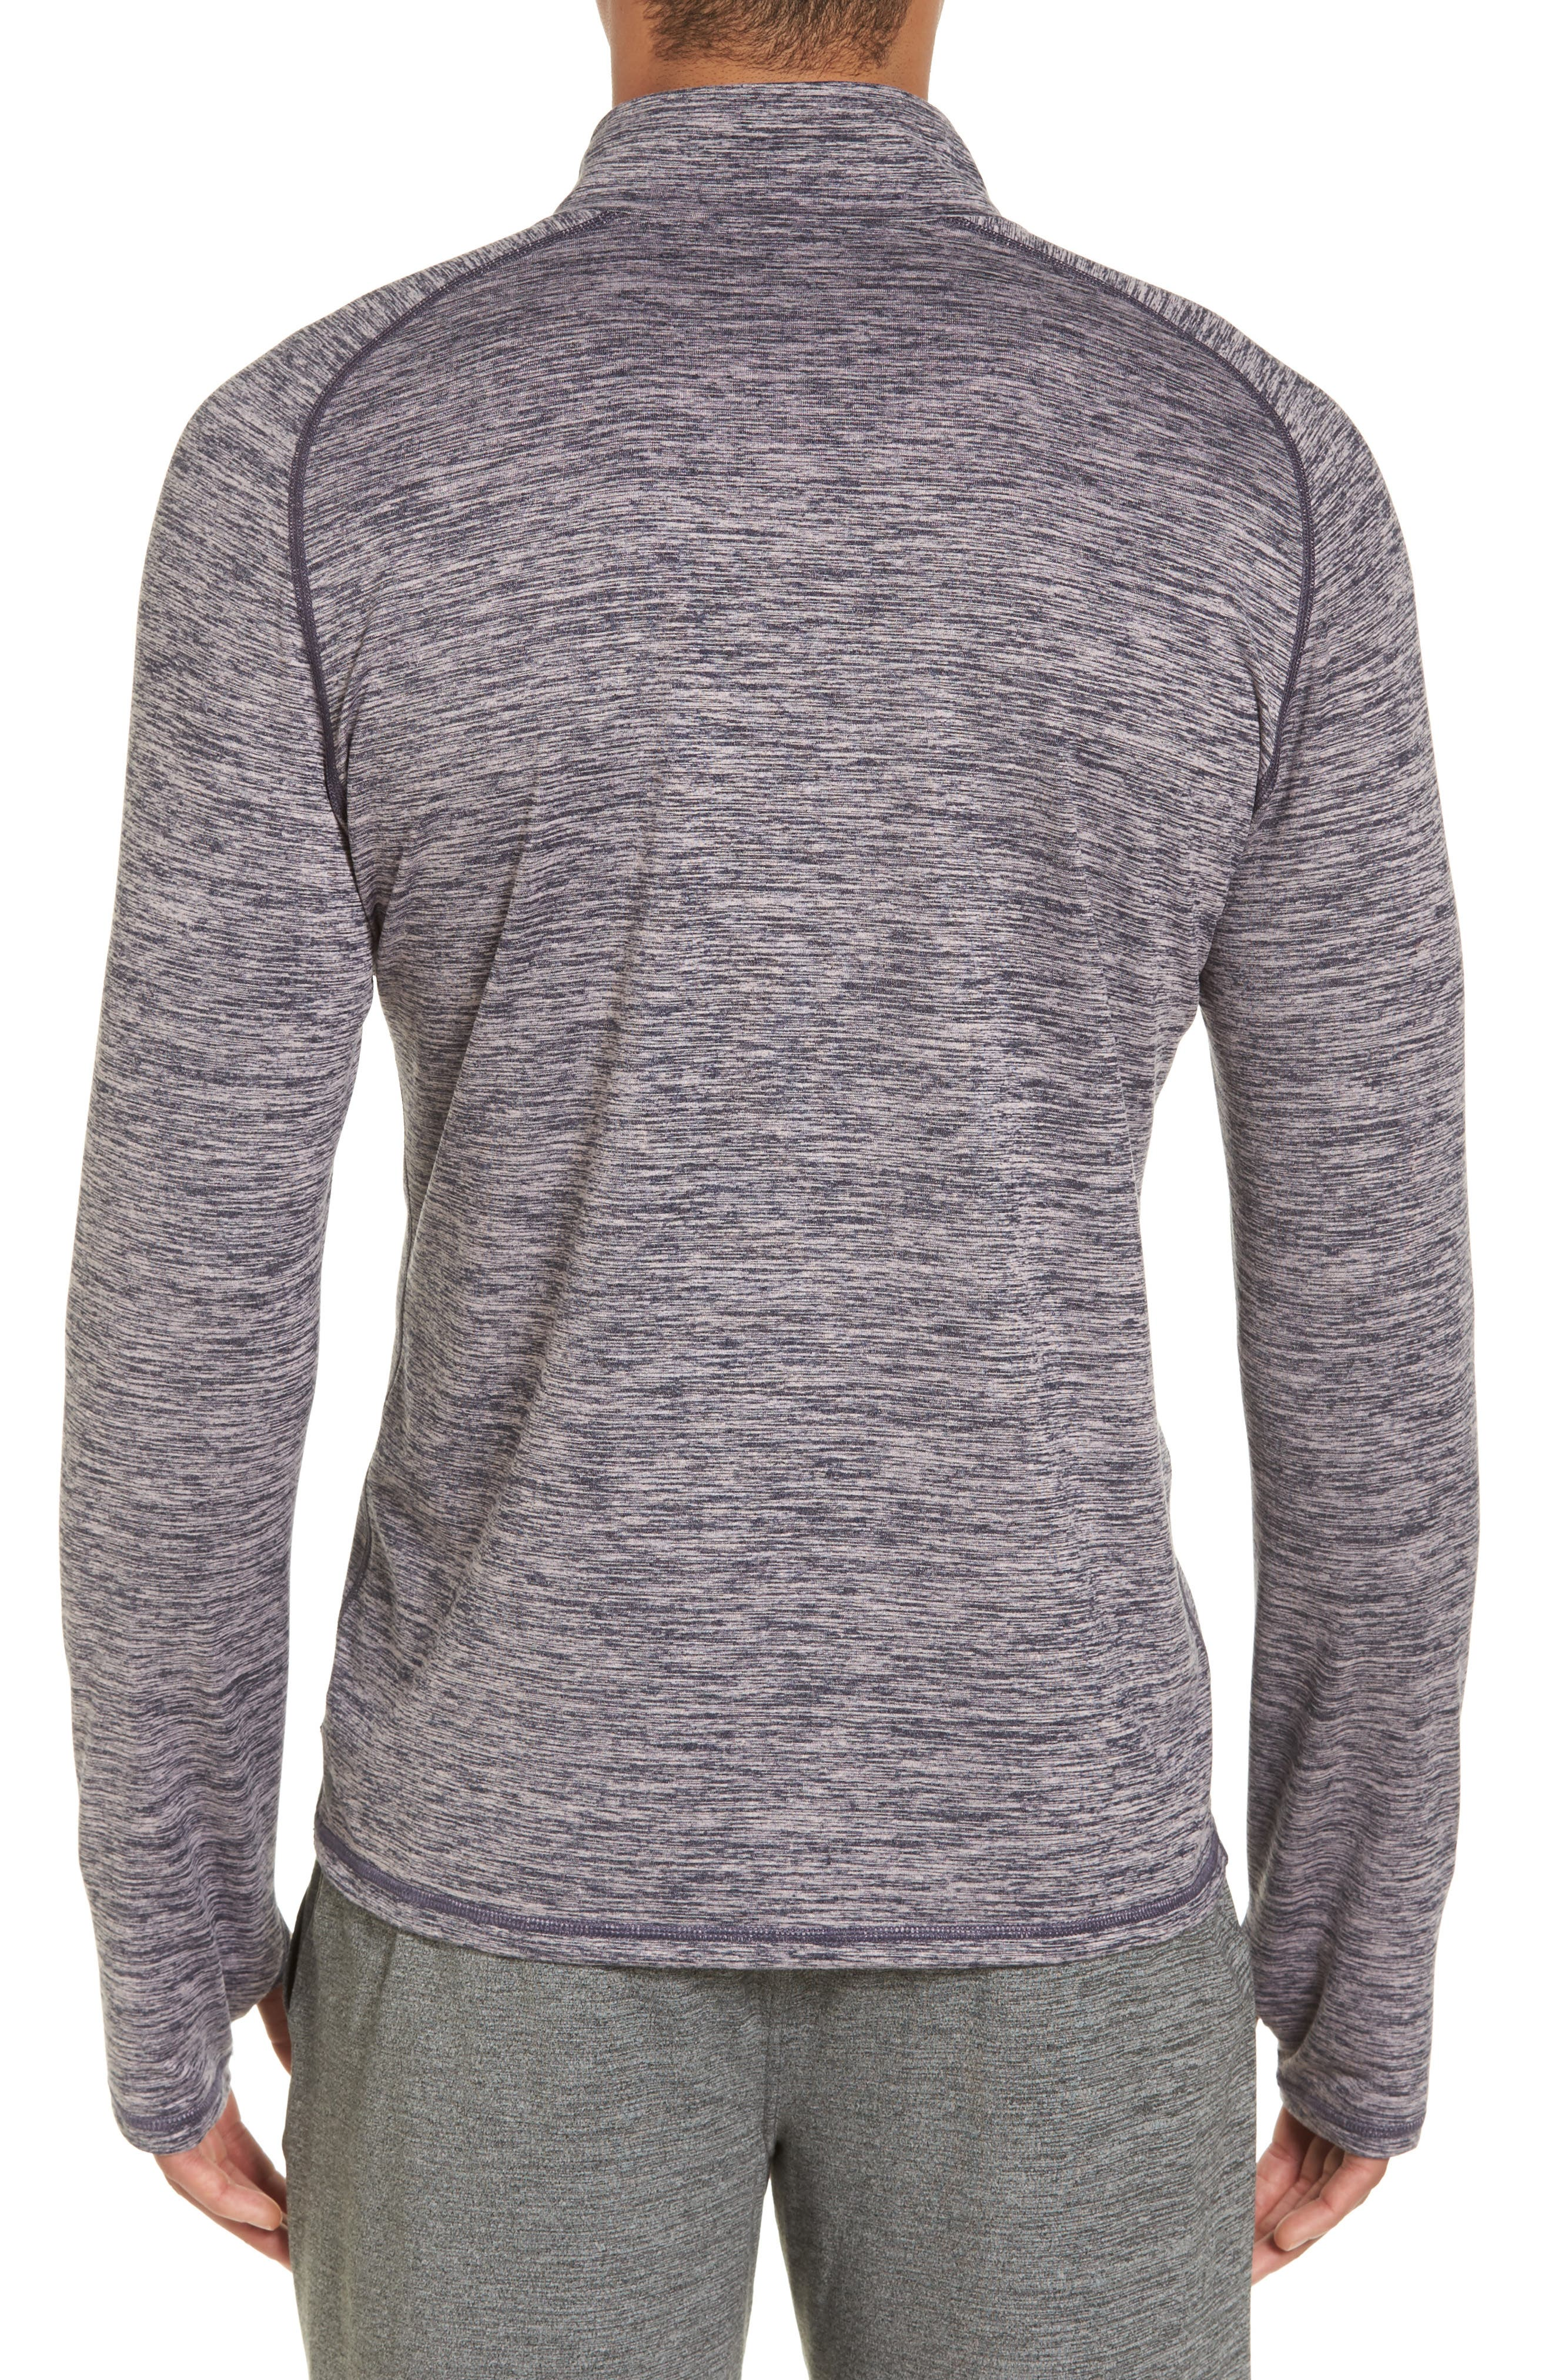 Celsian Quarter Zip Pullover,                             Alternate thumbnail 2, color,                             Purple Navy Melange